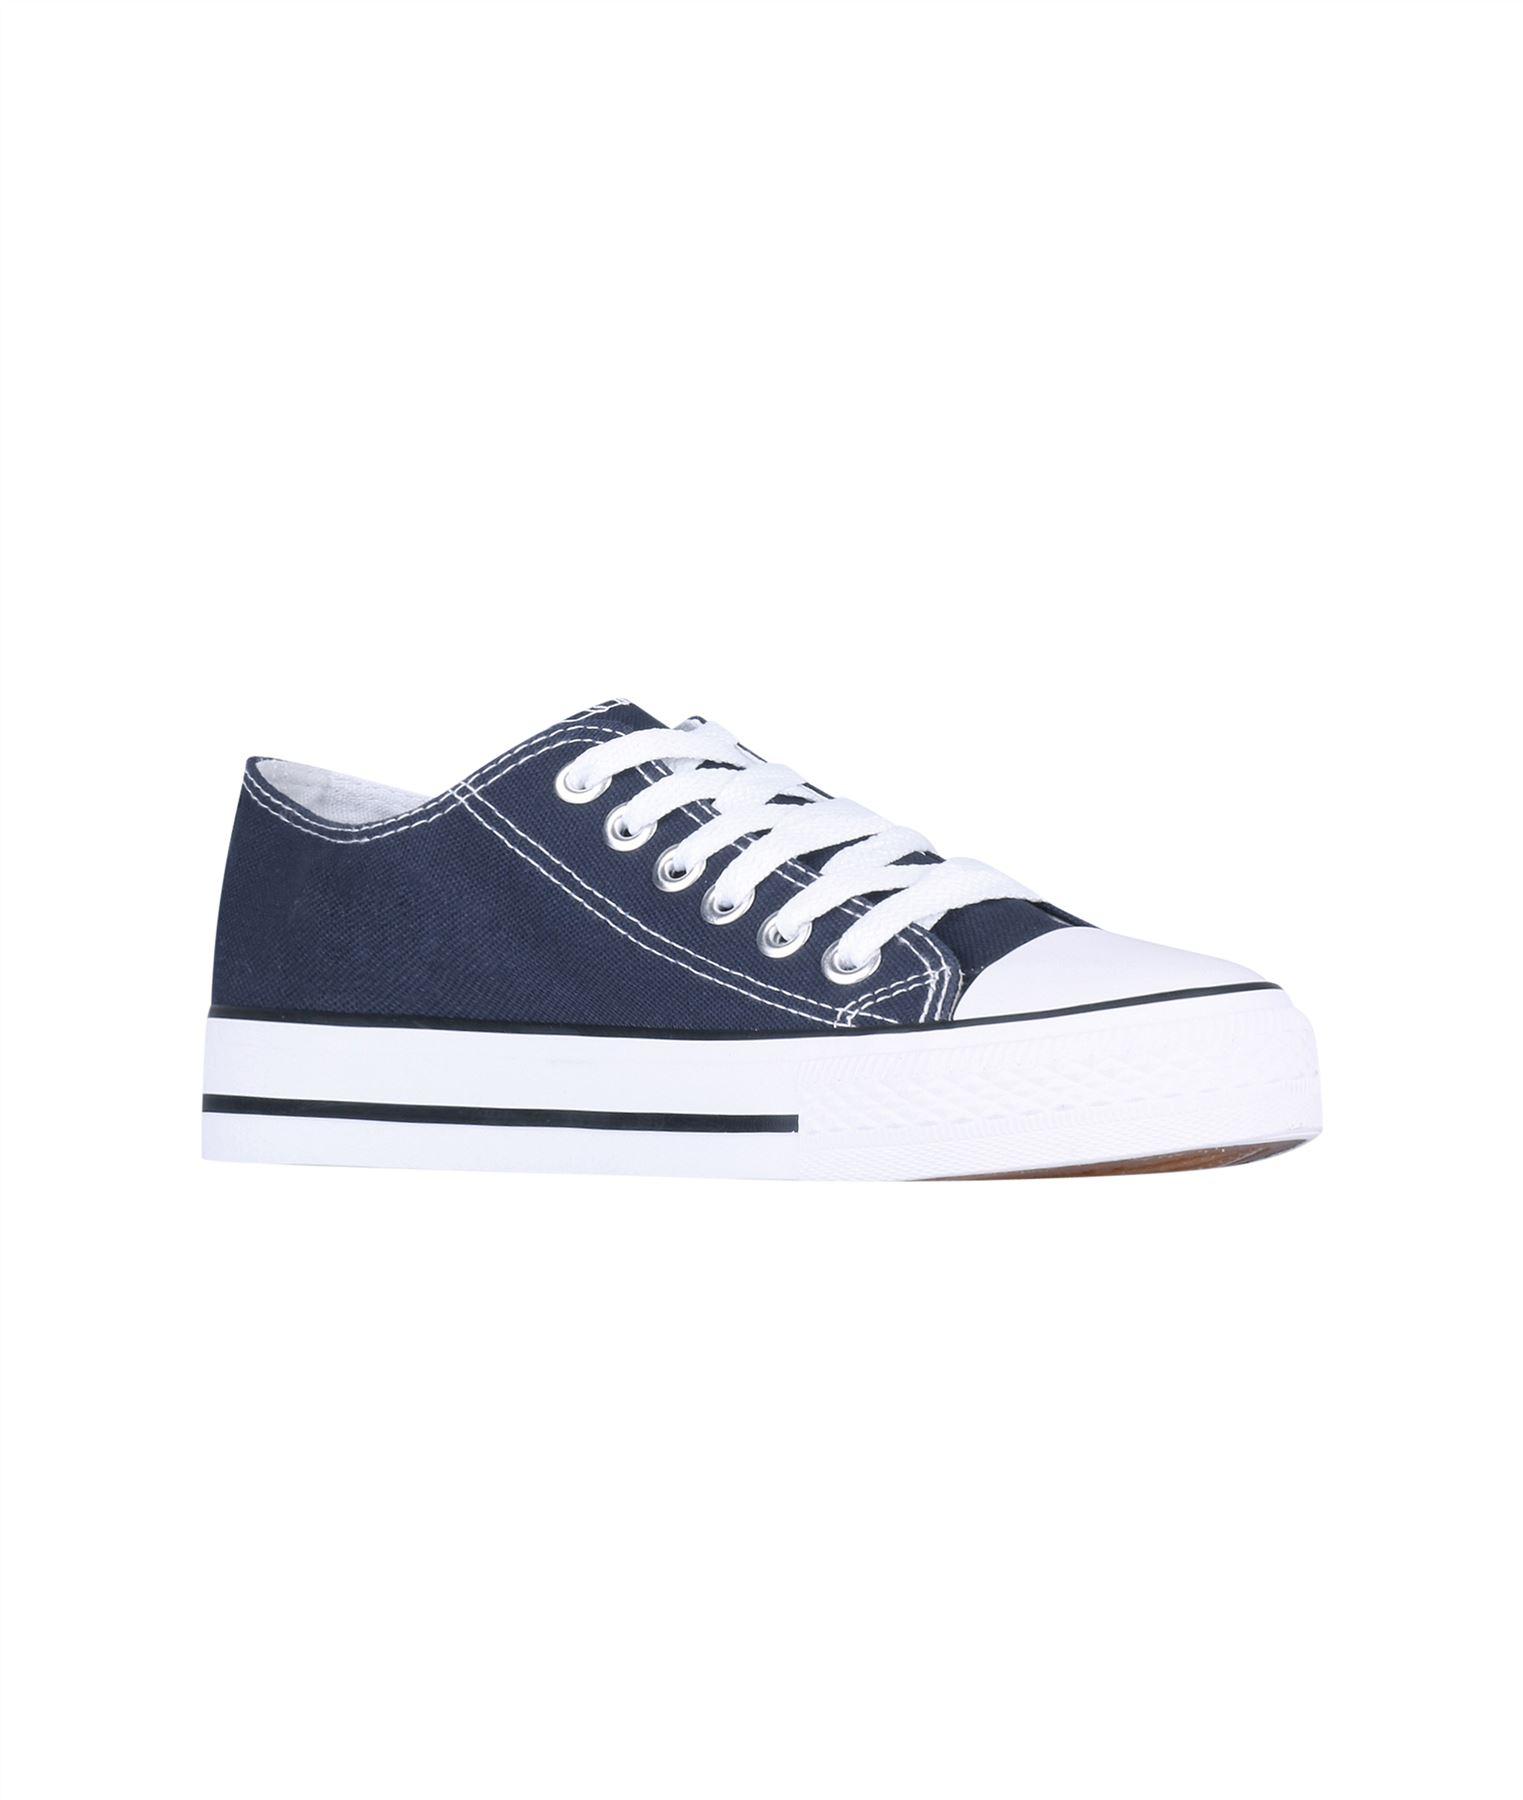 Zapatillas-Mujer-Casuales-Deportiva-Barata-Lona-Moda-Originales-Outlet-Tela-Moda miniatura 3